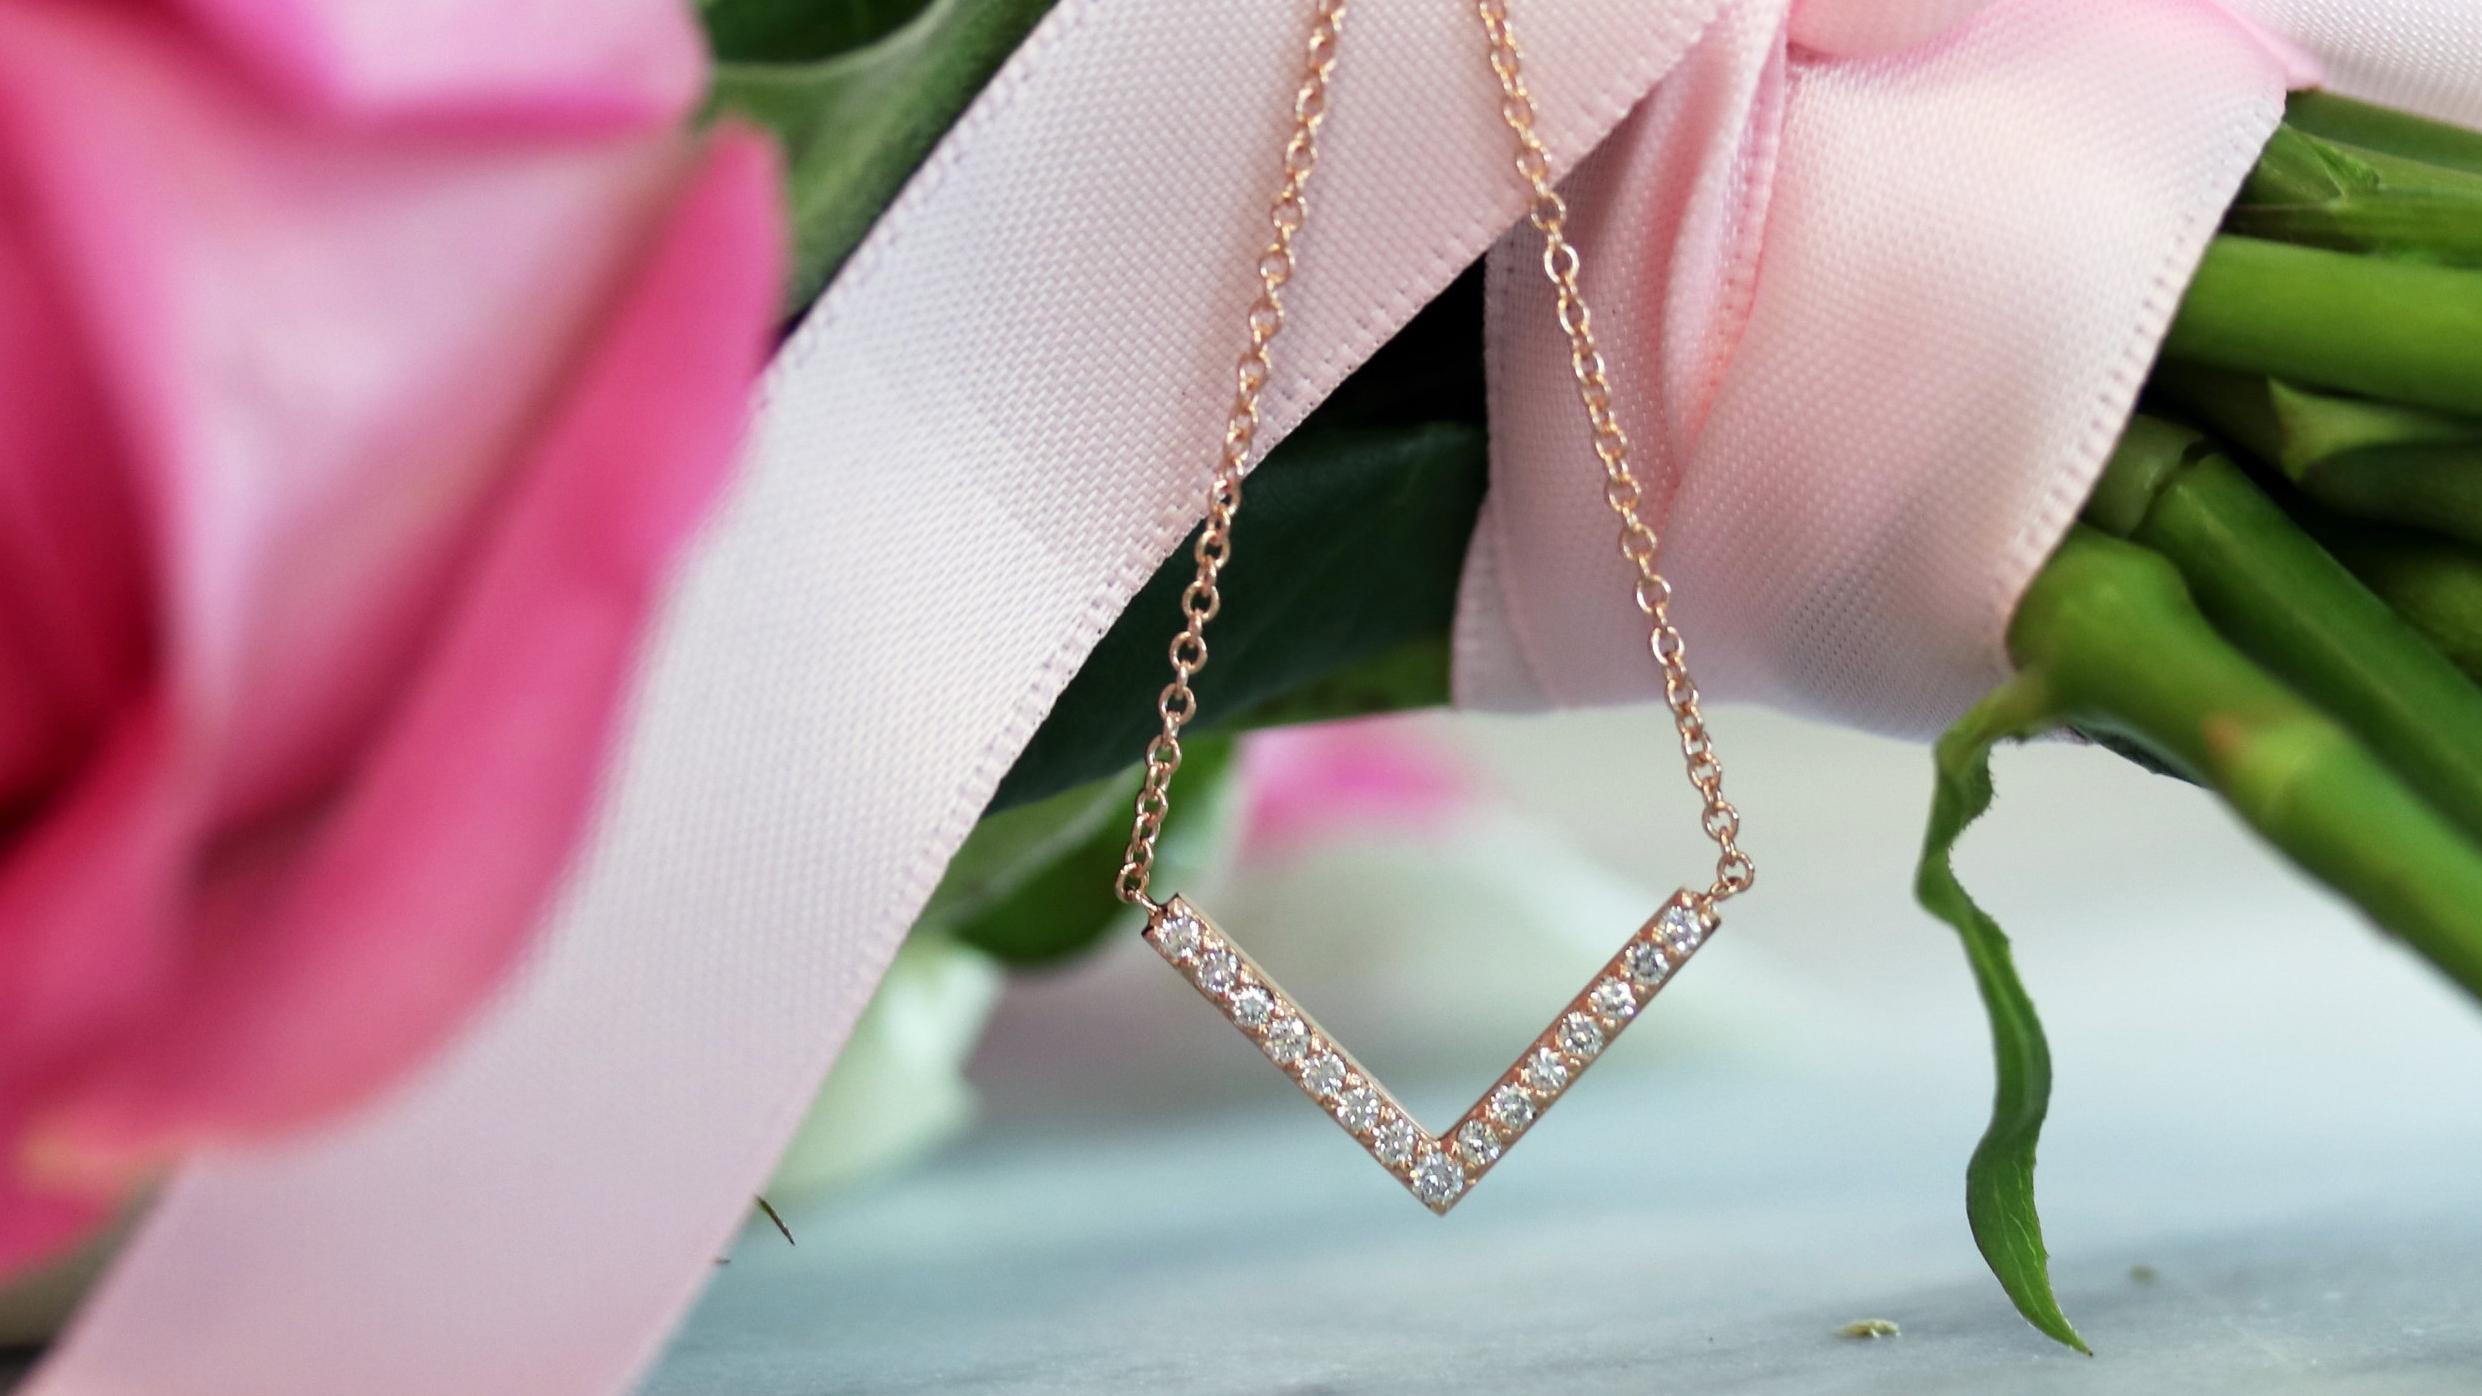 V Lab Diamond Pendant Necklace in 14k White Gold 0.24ctw AD-120